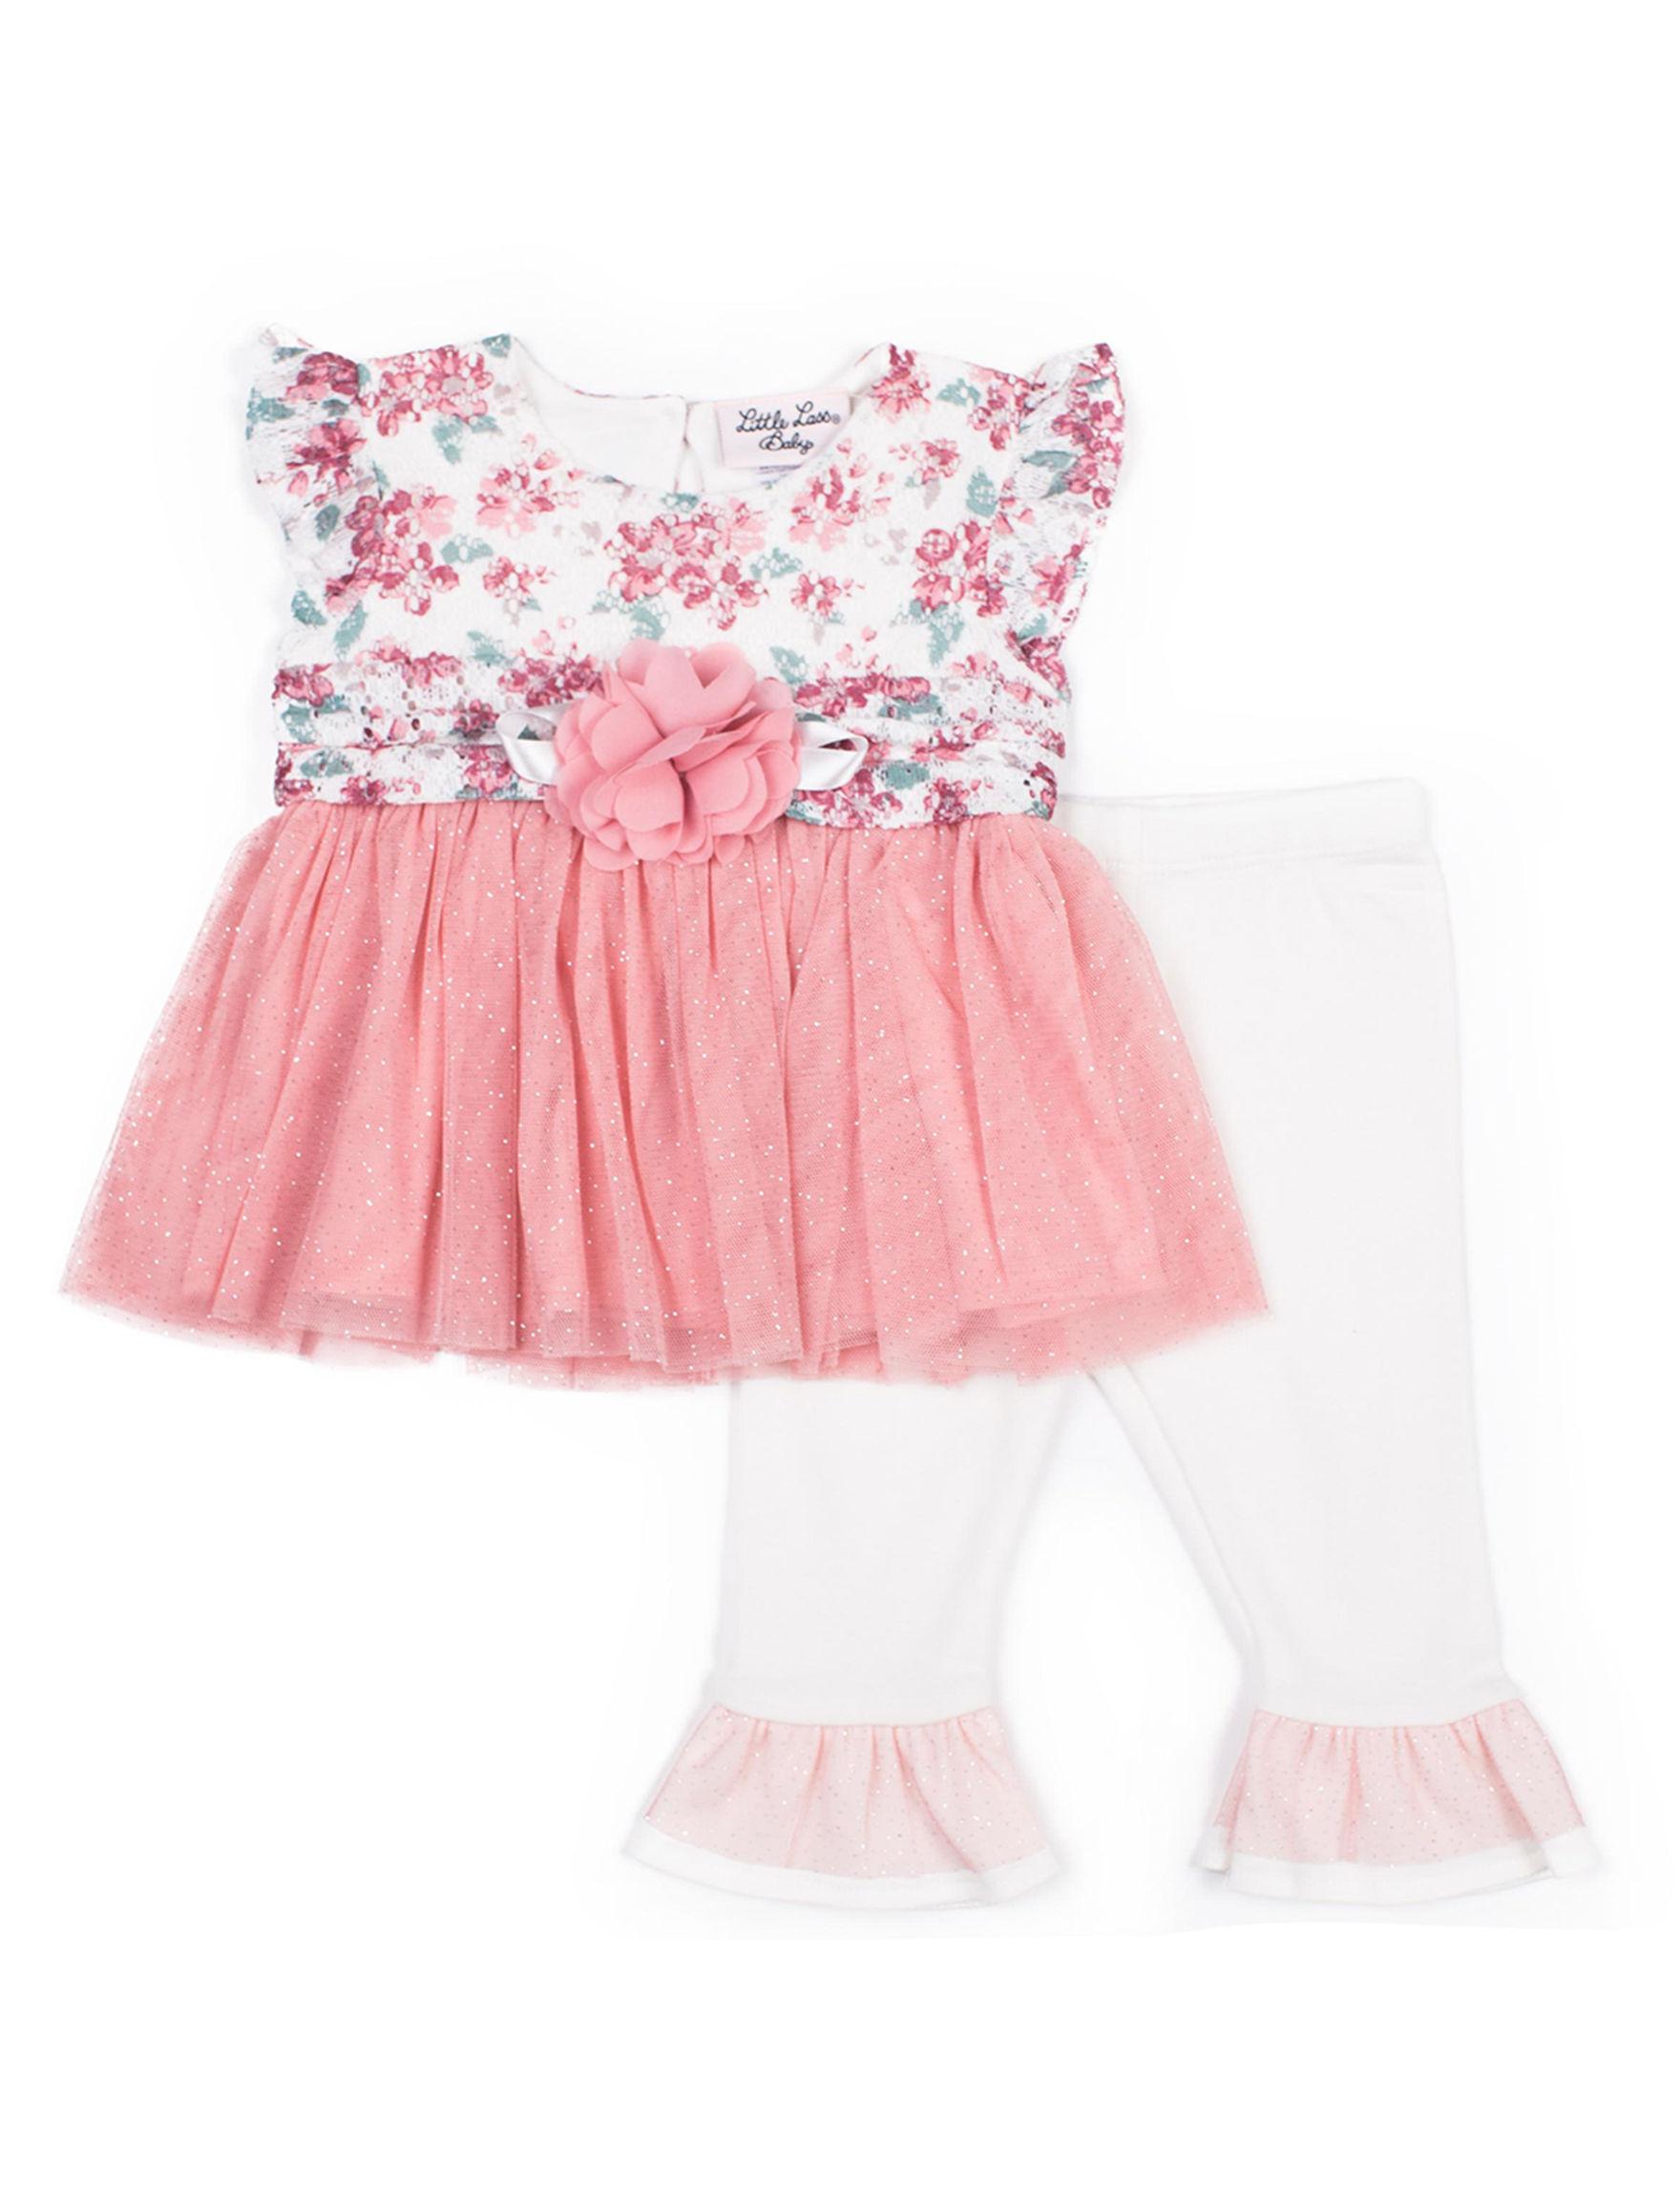 Little Lass Pink Floral